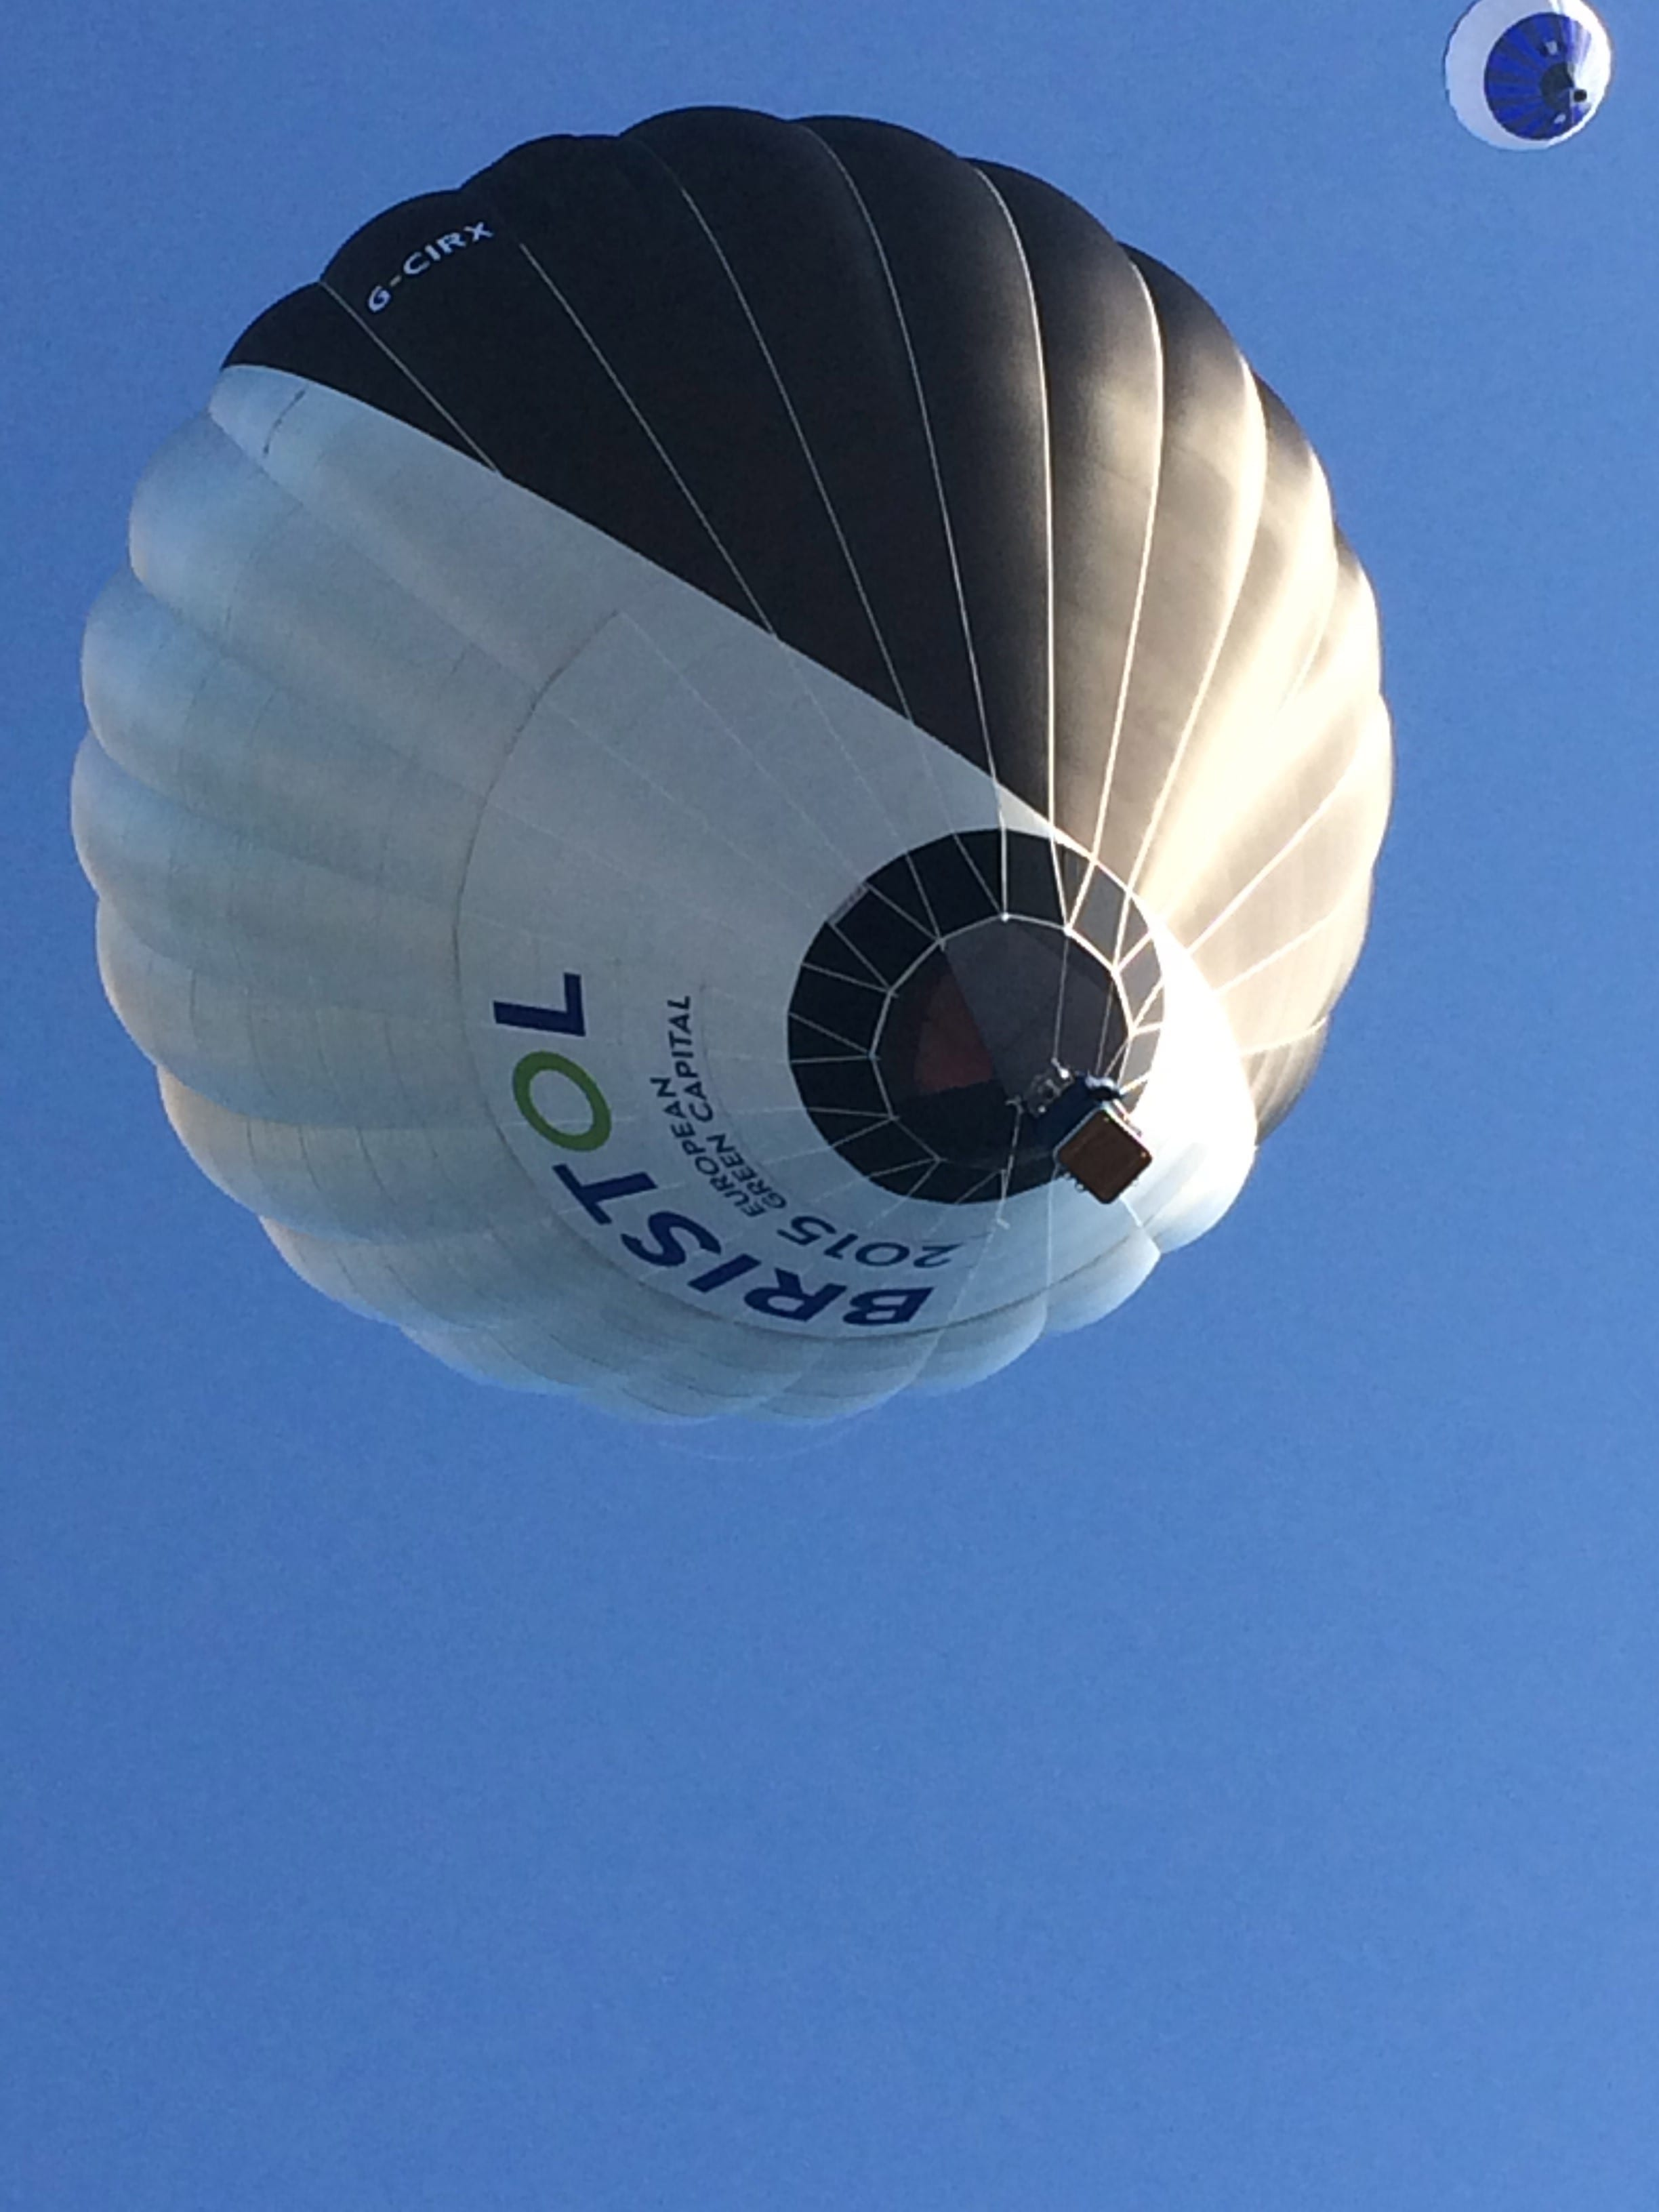 Bristol Solar Balloon